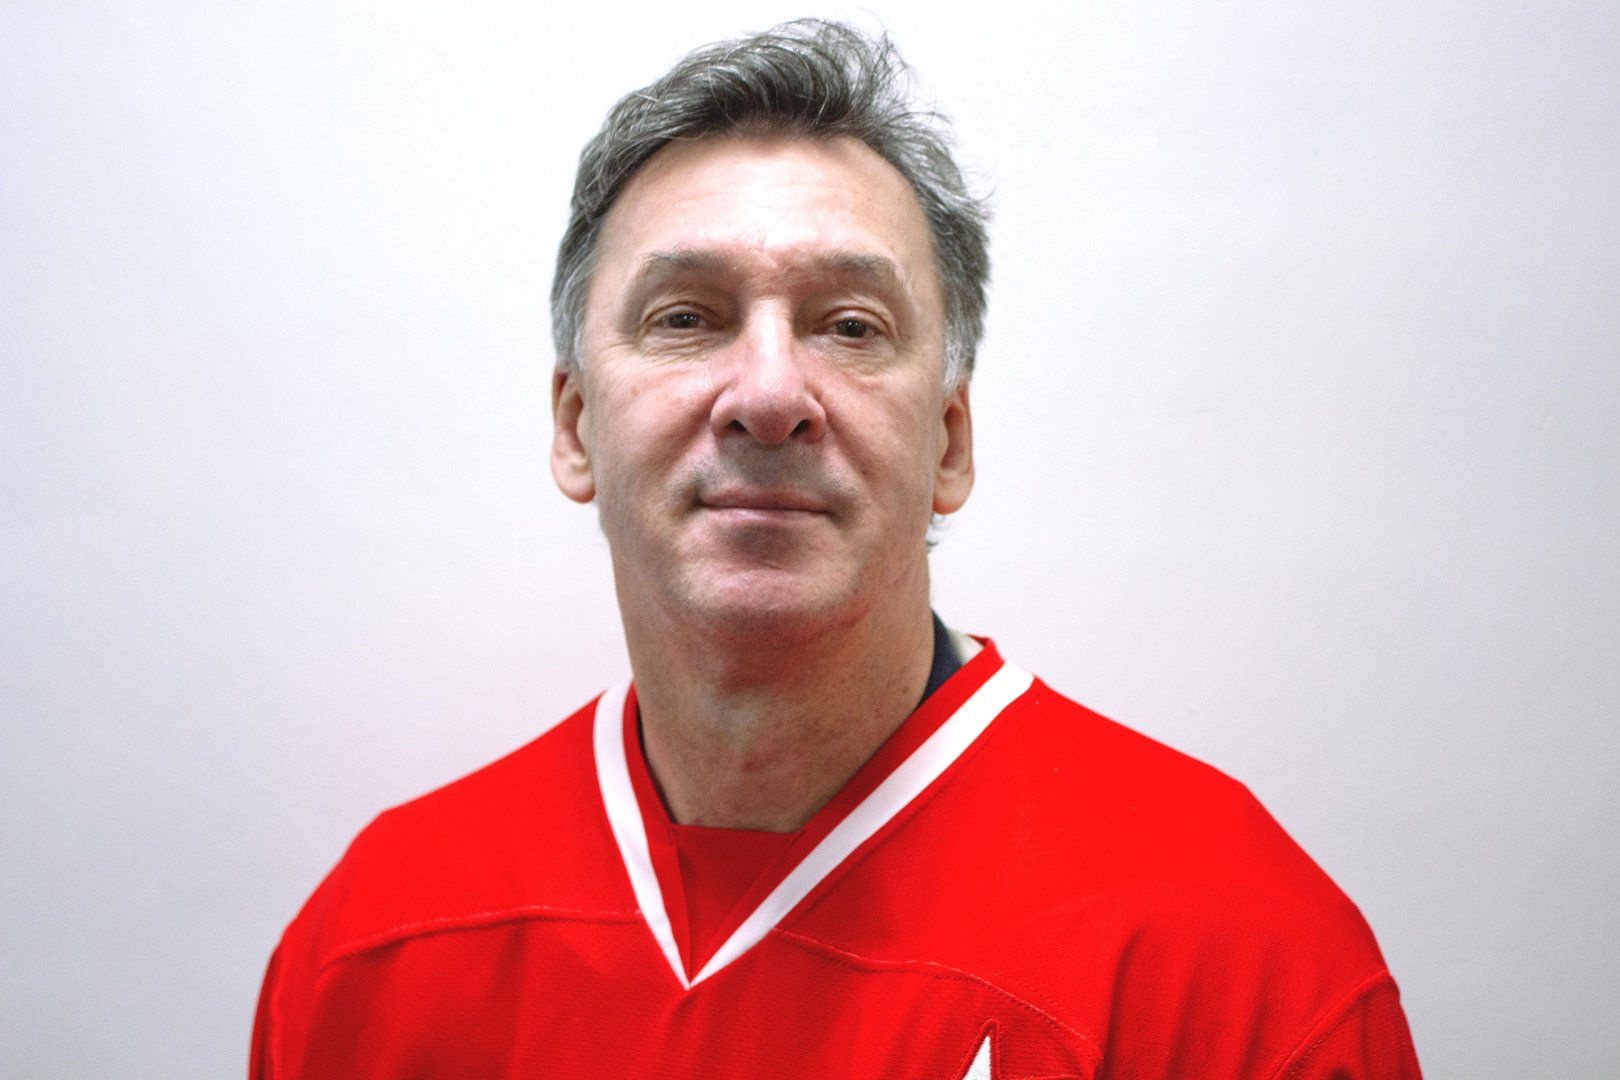 Светлов Сергей Александрович